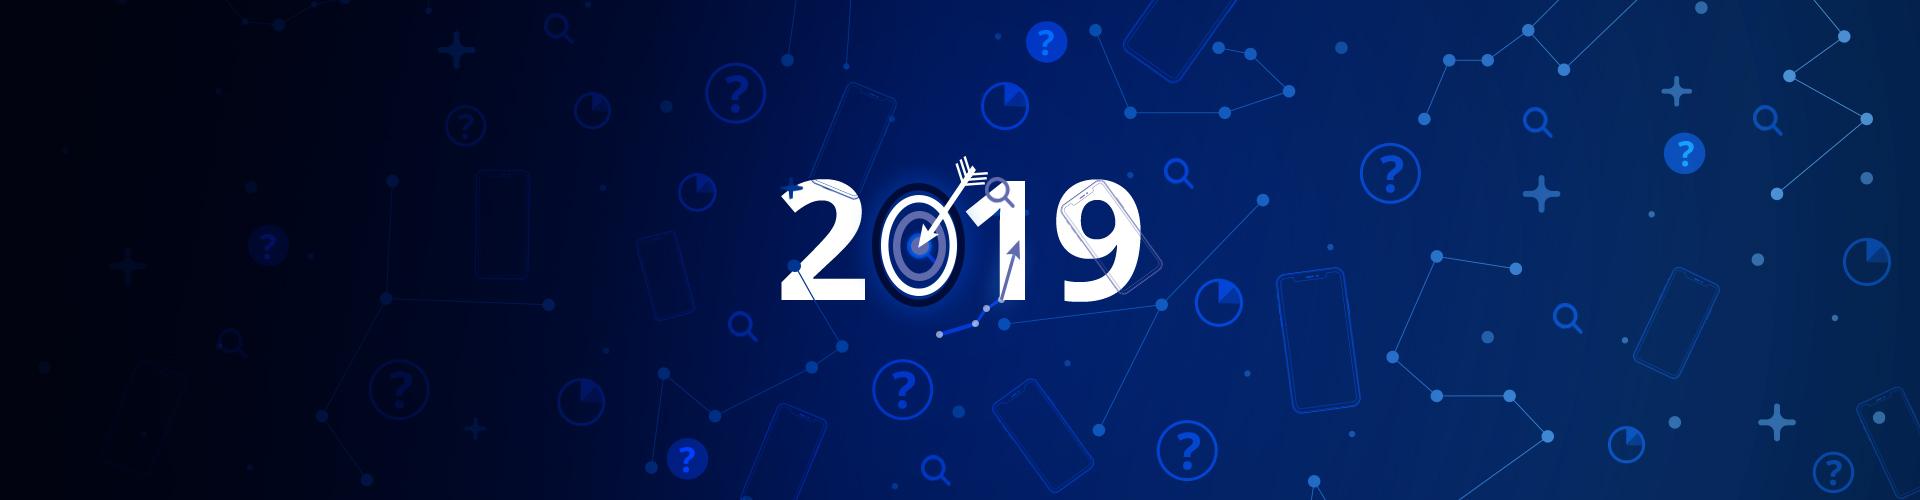 PageSuite's 2019 Digital Publishing Predictions